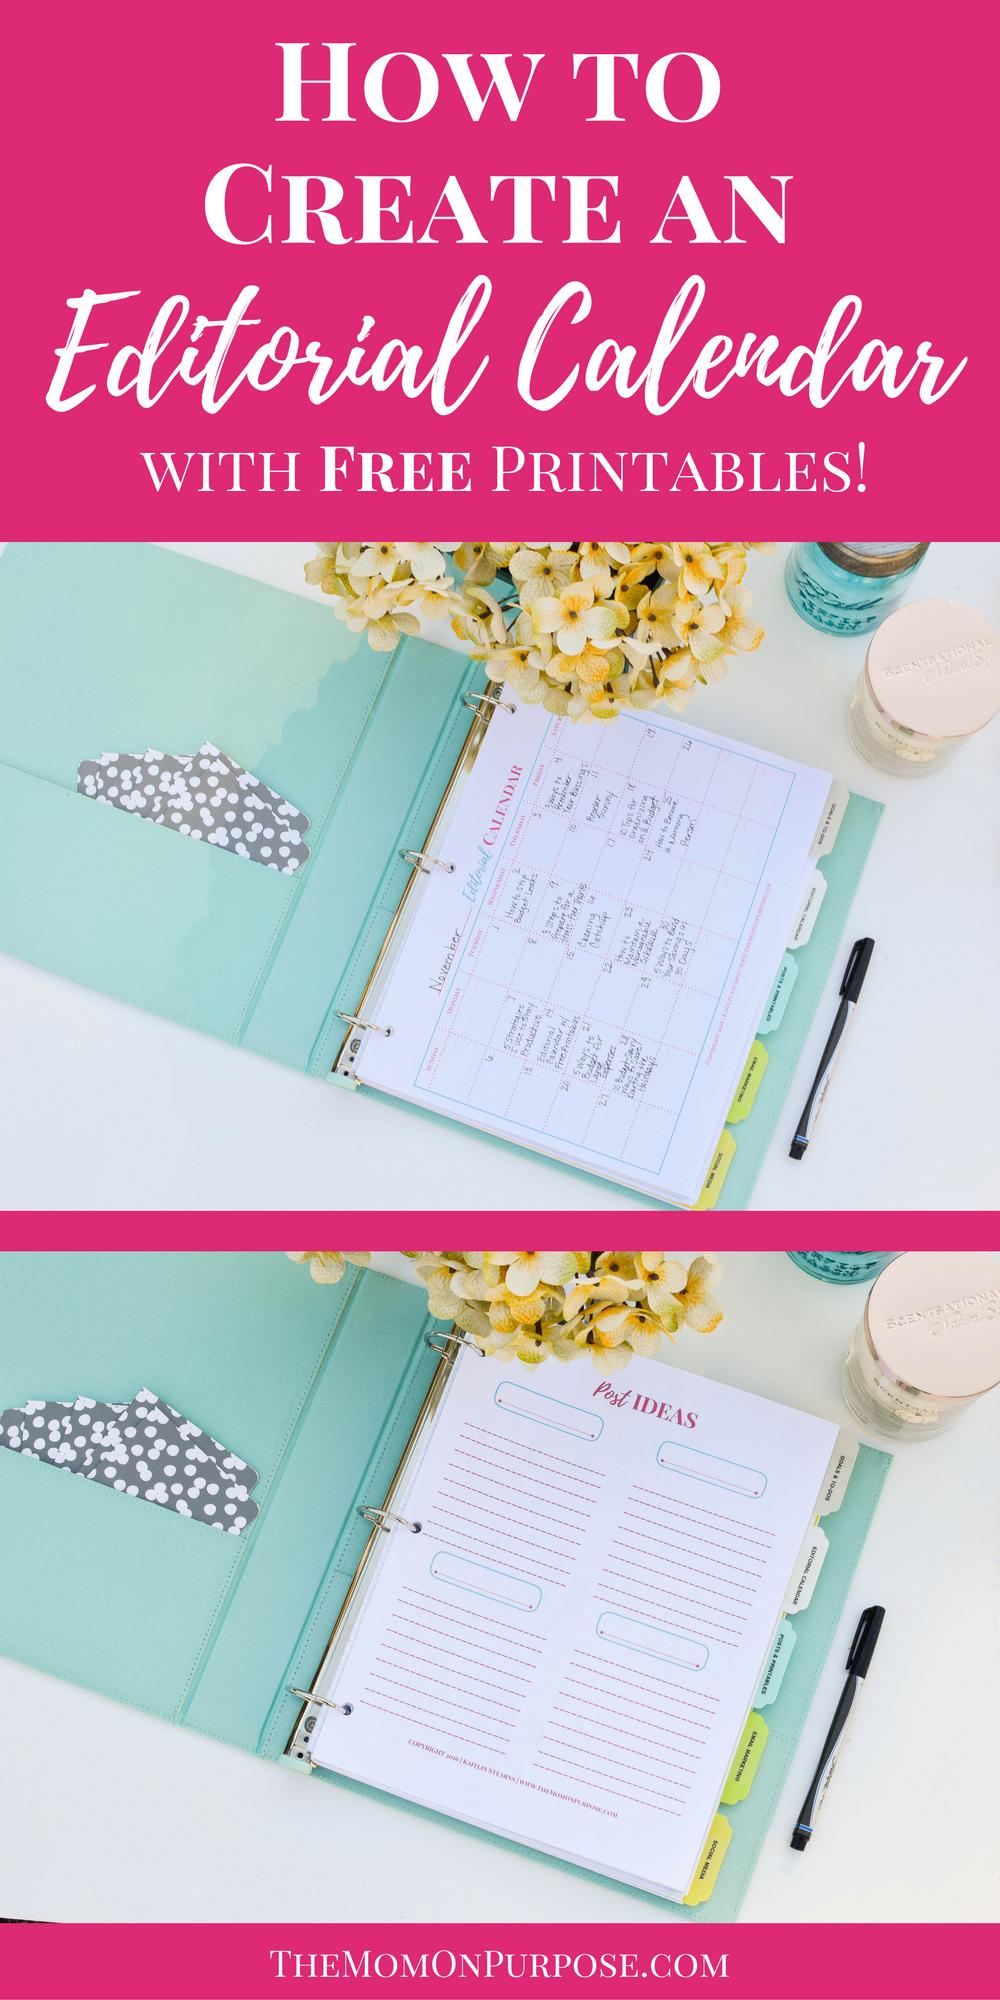 Diy Editorial Calendar : How to create an editorial calendar with free printables